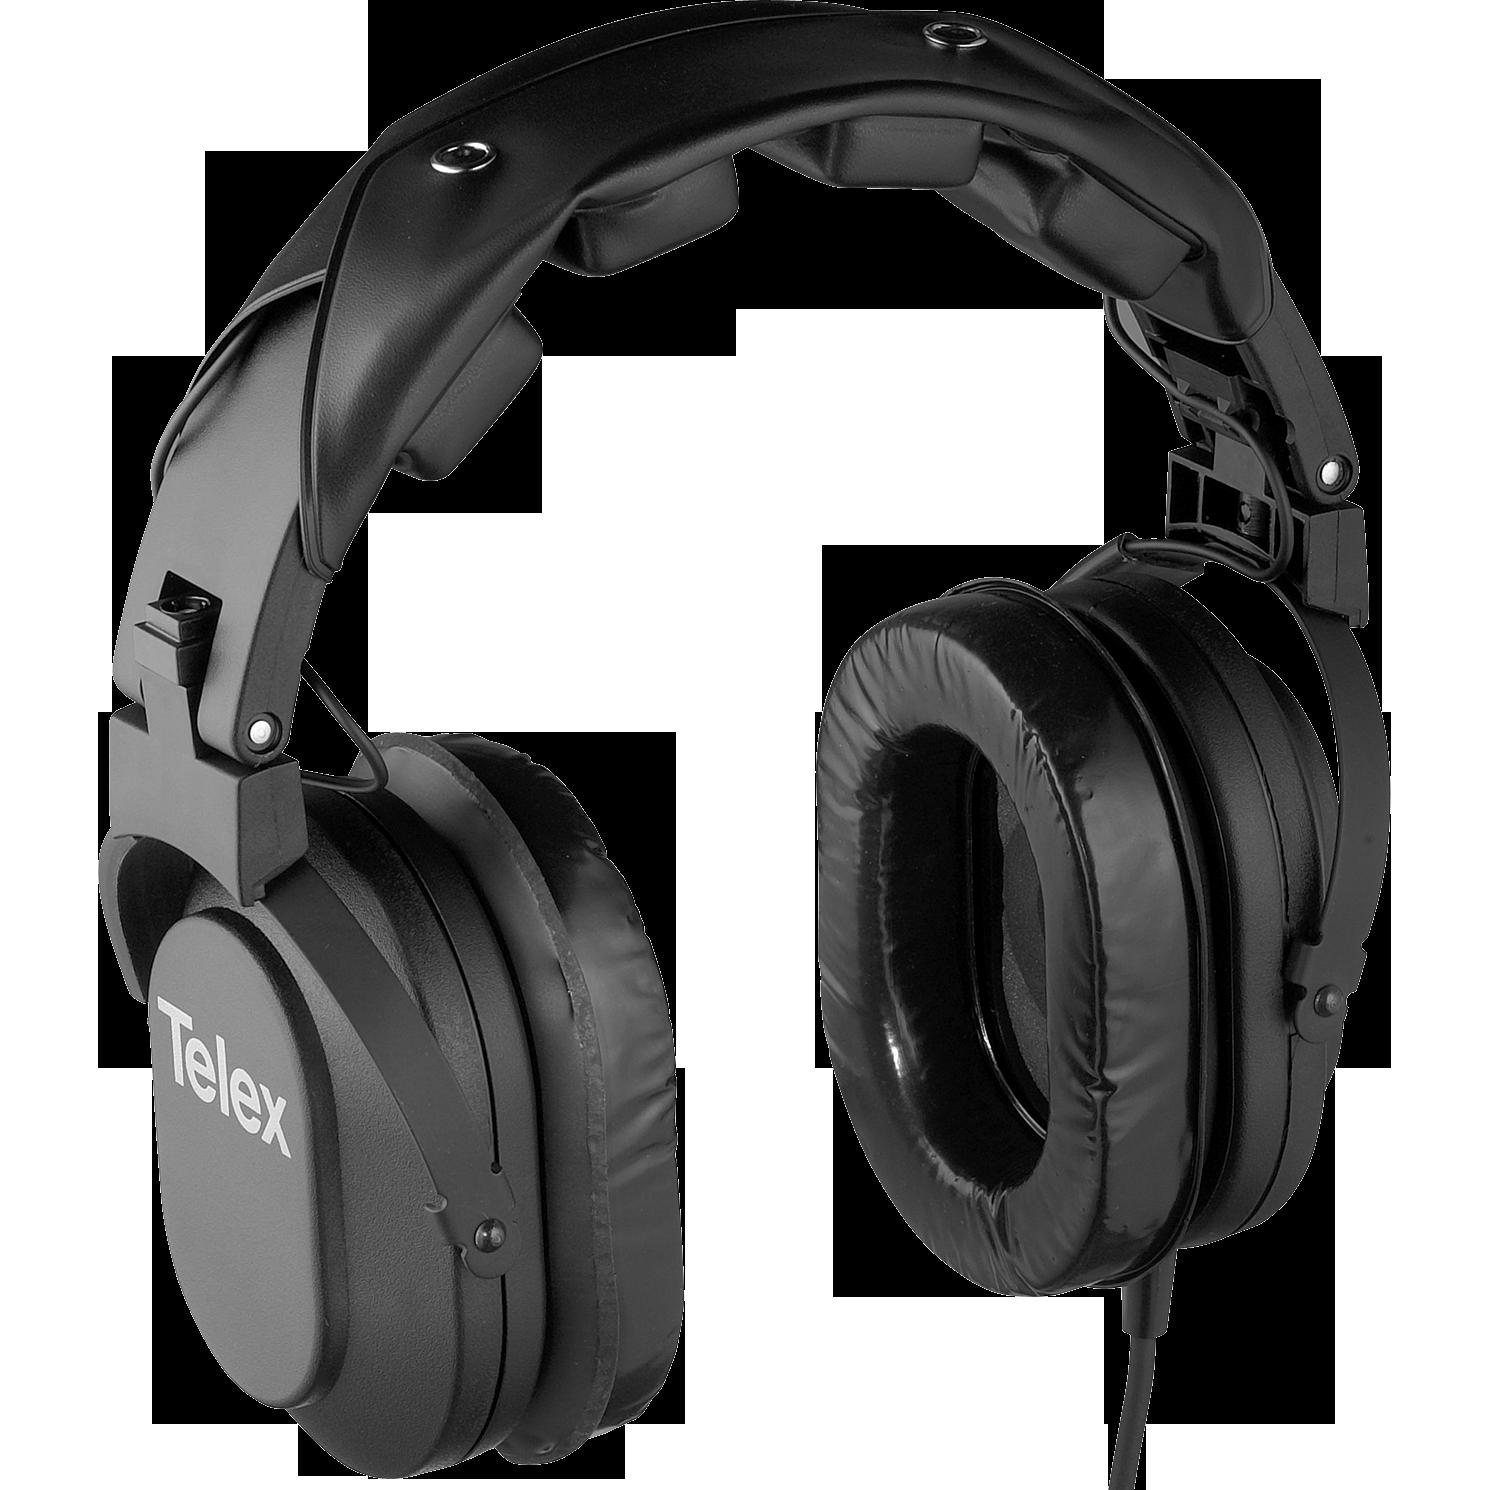 Headphones Png Image #20163 - Headphones, Transparent background PNG HD thumbnail